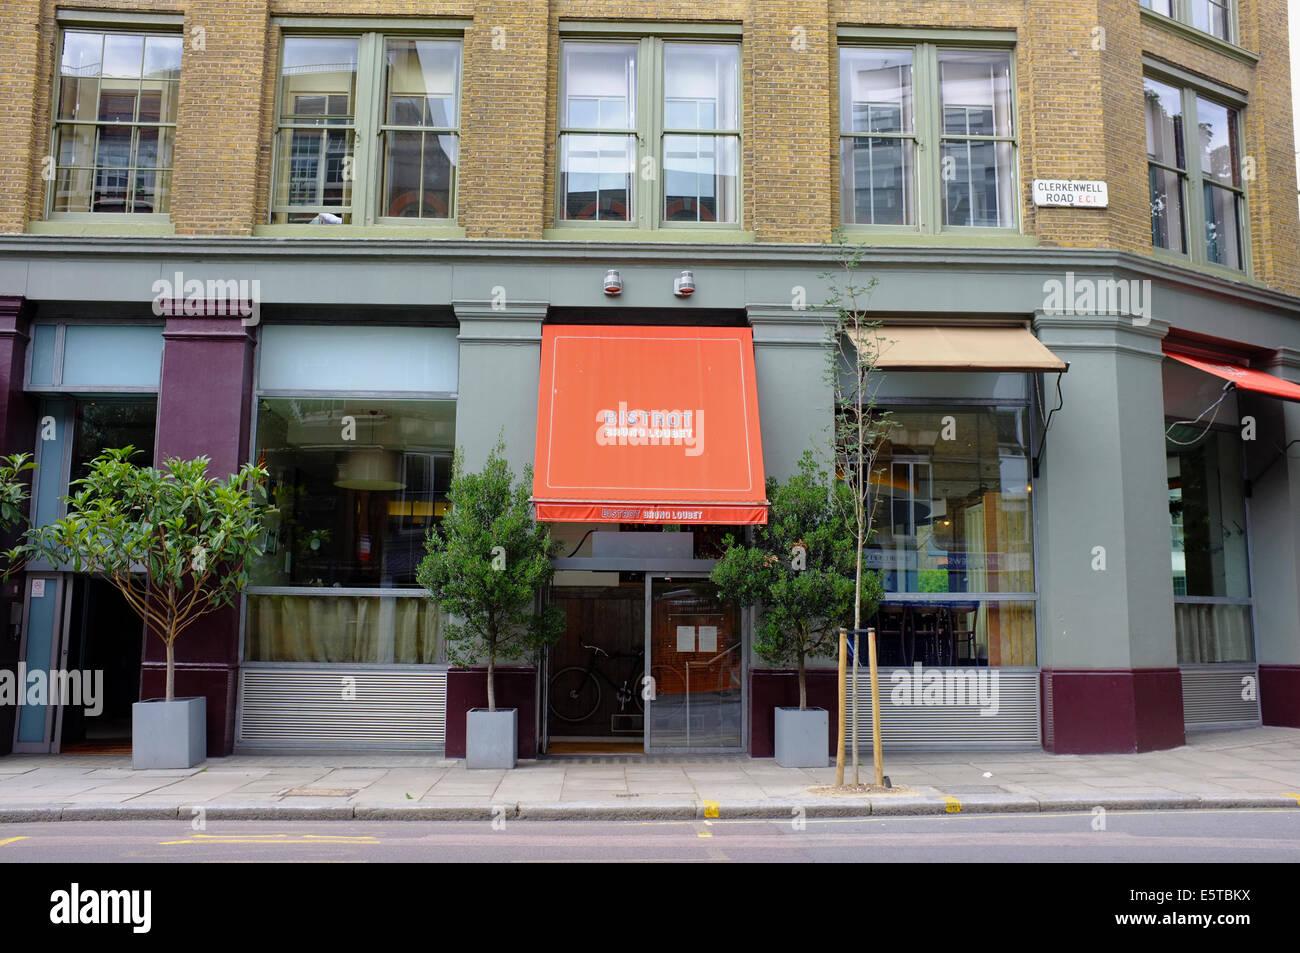 Bistrot Bruno Loubet restaurant on Clerkenwell Road, London - Stock Image